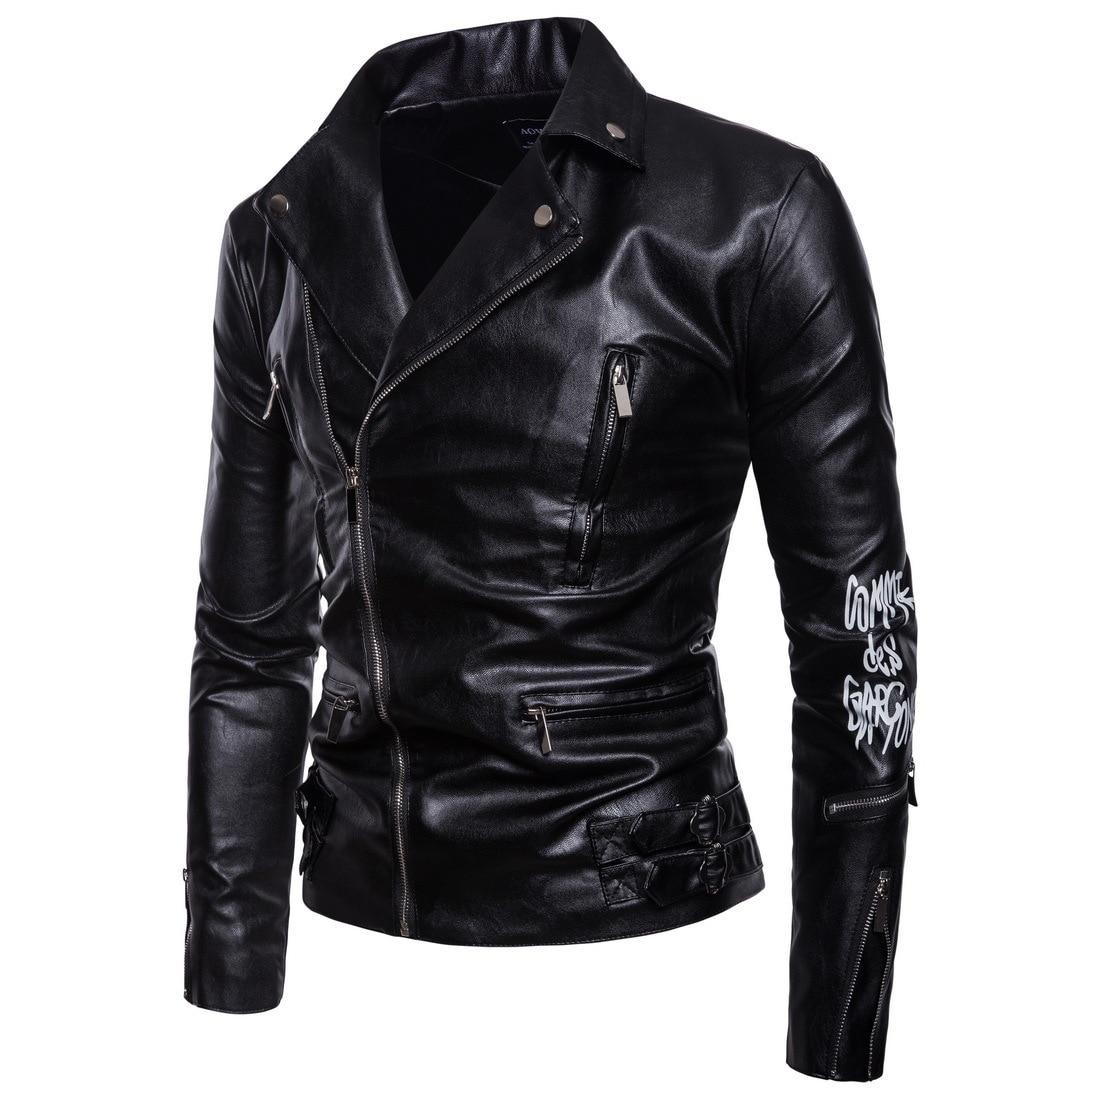 European 2019 Leather jaket men Motorcycle Bomber Dora Chain Printing Clothing Slim fit Male PUNK Halley Leather Jacket Coat